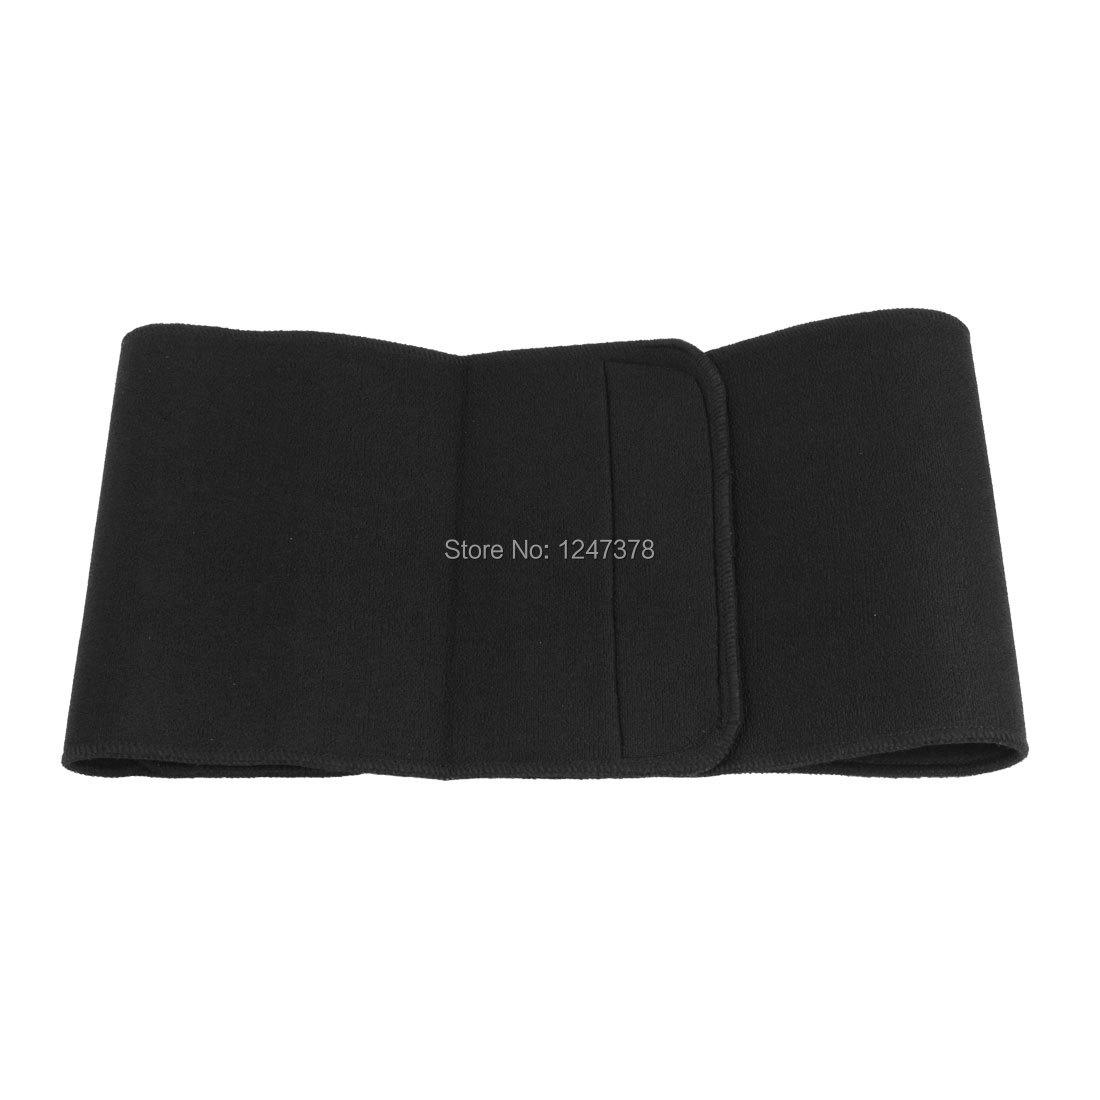 Compressive Neoprene Waist Support Pain Brace Belt Black(China (Mainland))